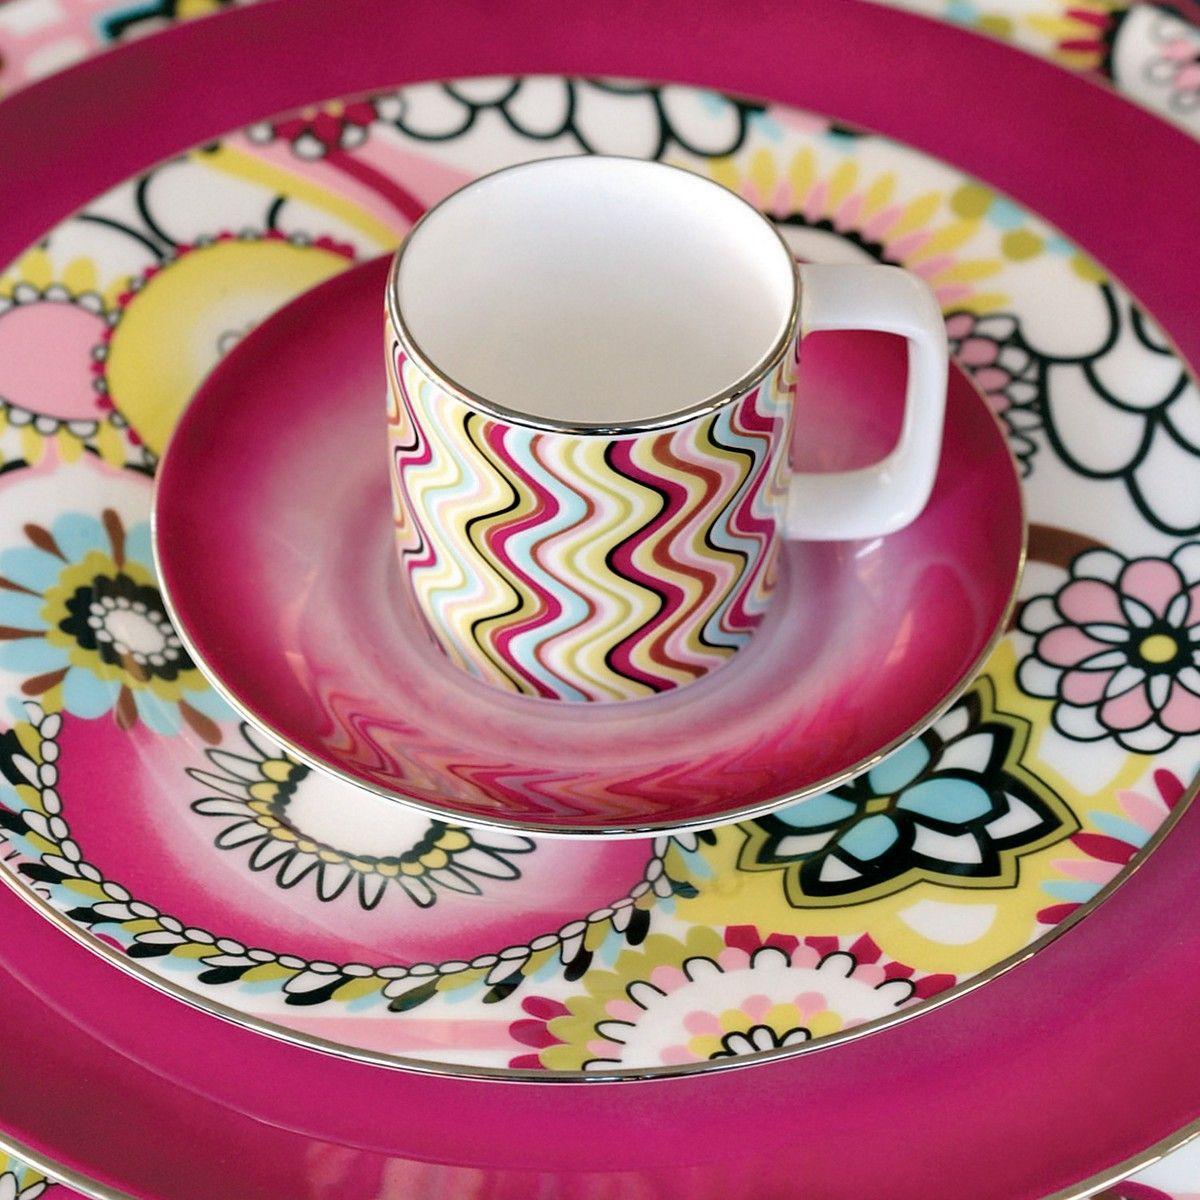 Missoni \ Margherita\  bone china at Bloomingdale\u0027s & O Missoni you\u0027ve done it again...swoon...Missoni \